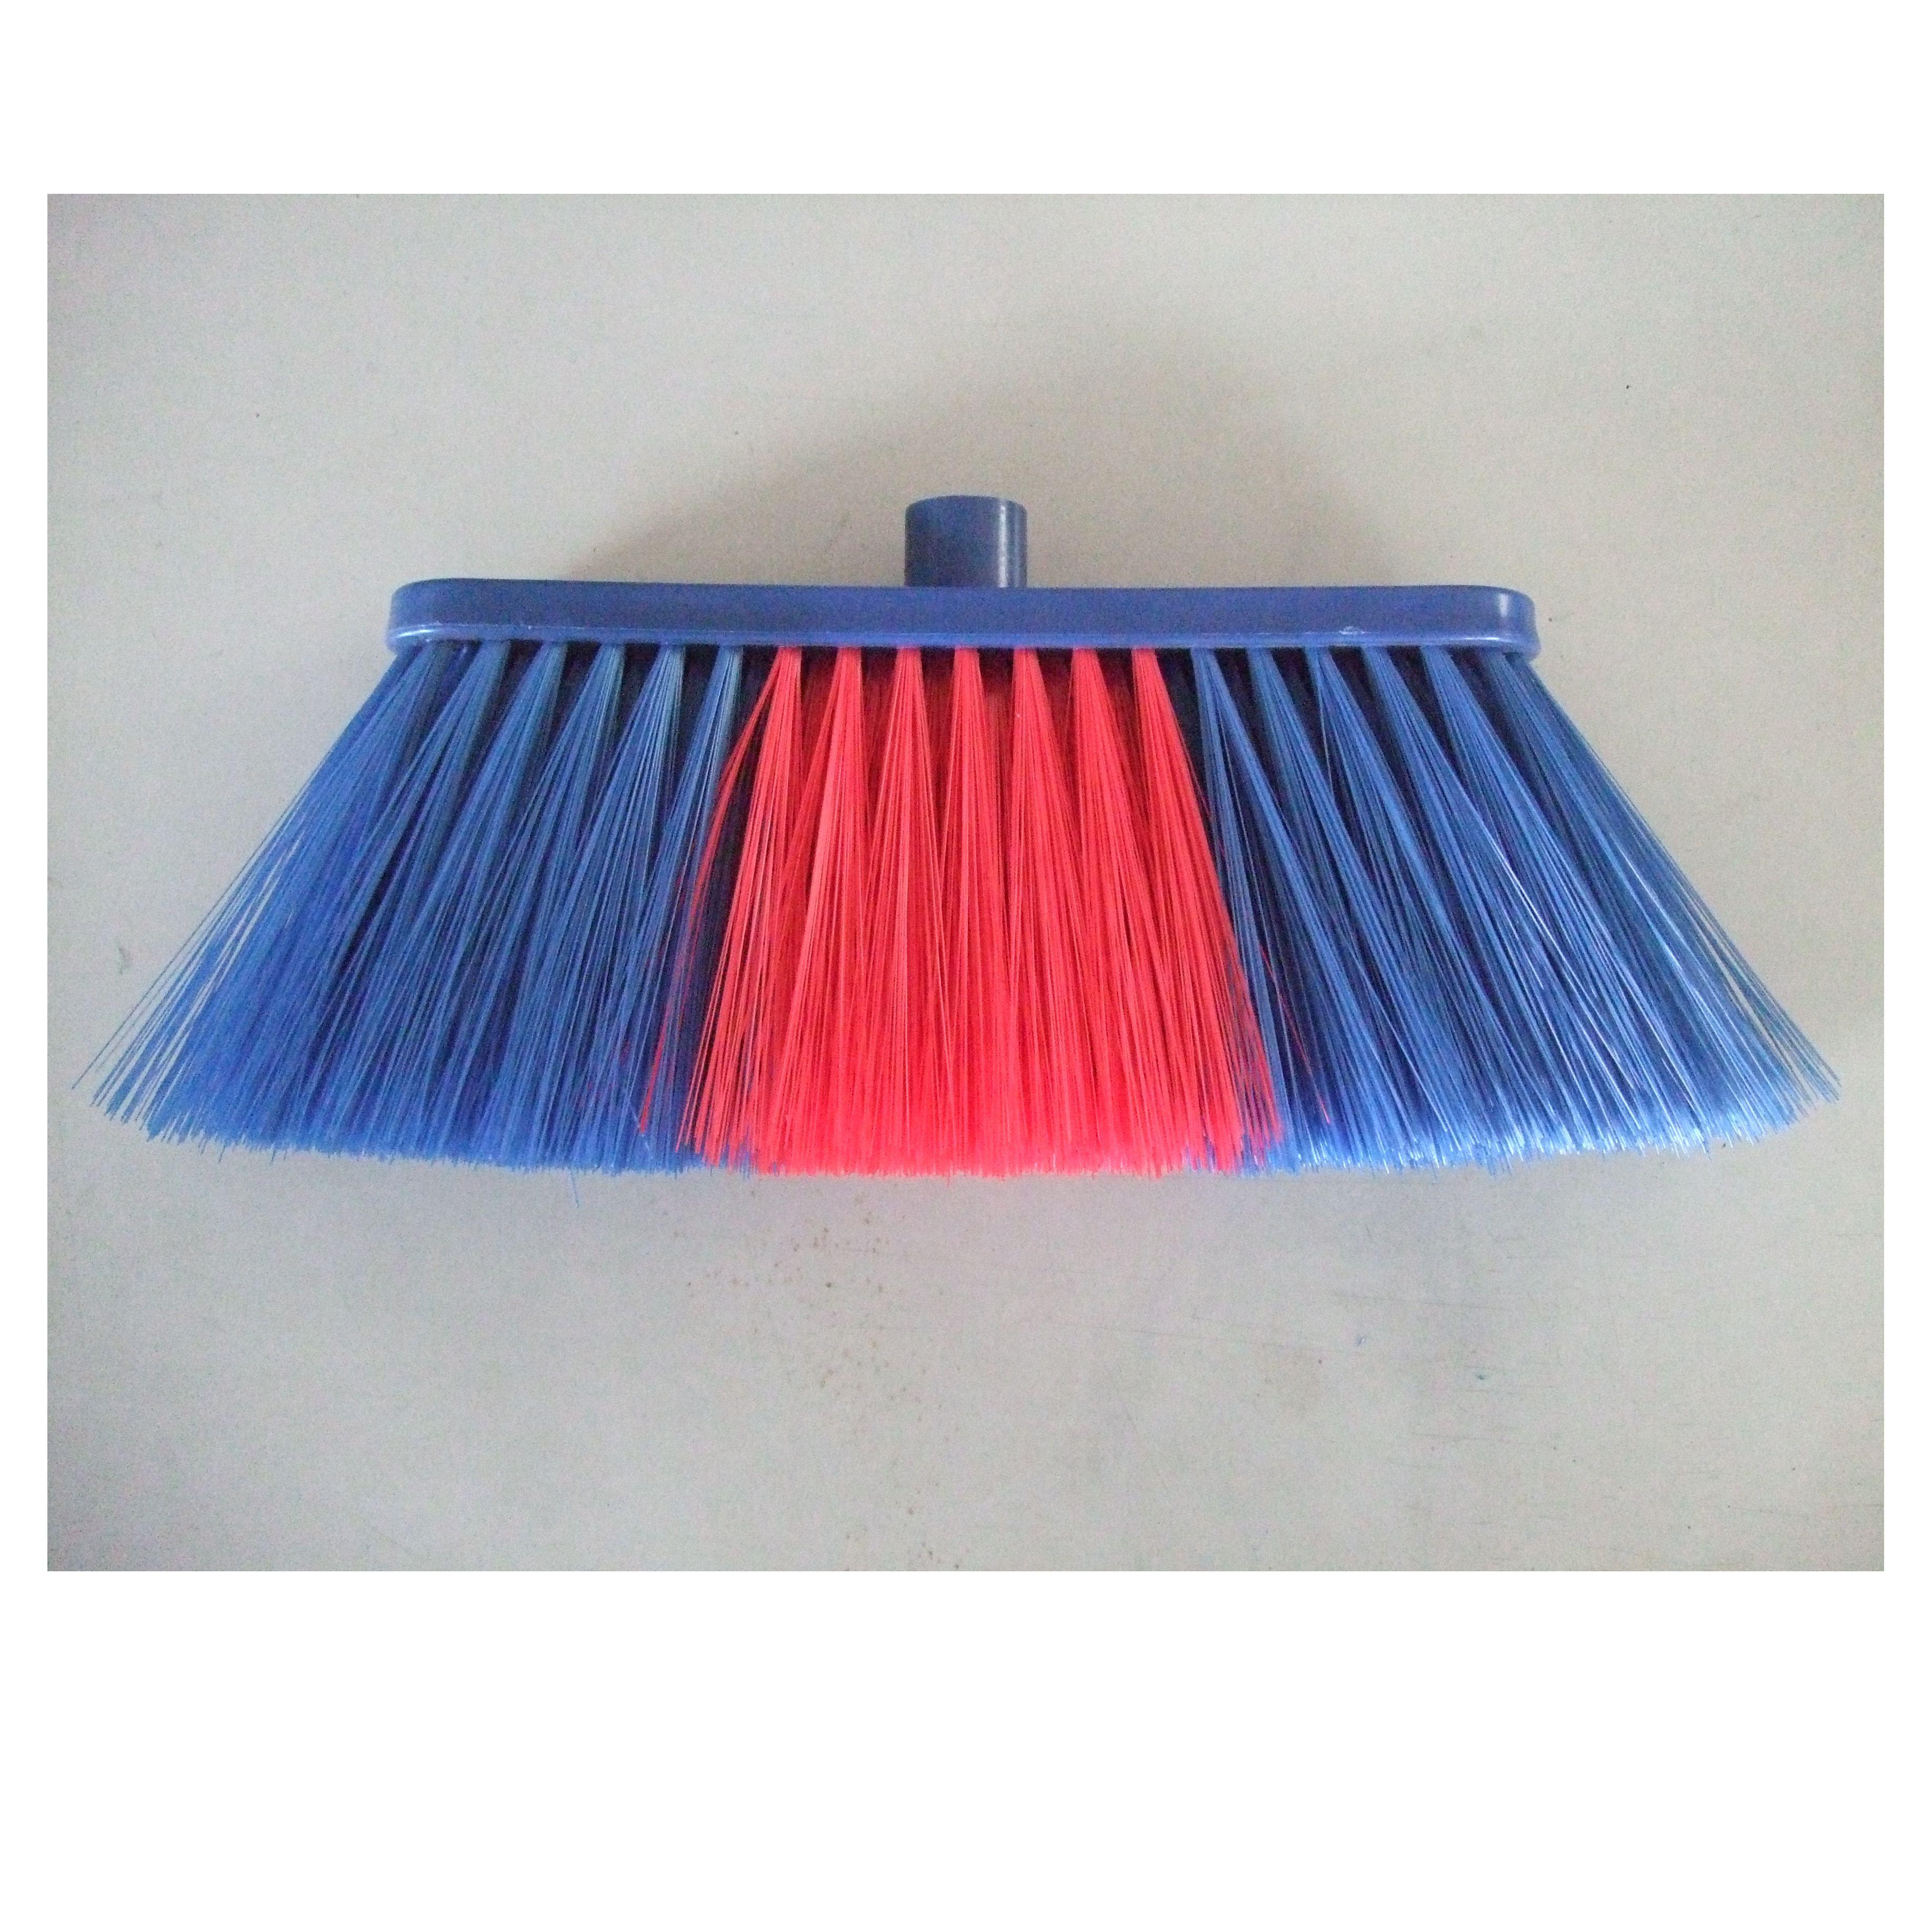 wholesale plastic indoor cleaning broom heads